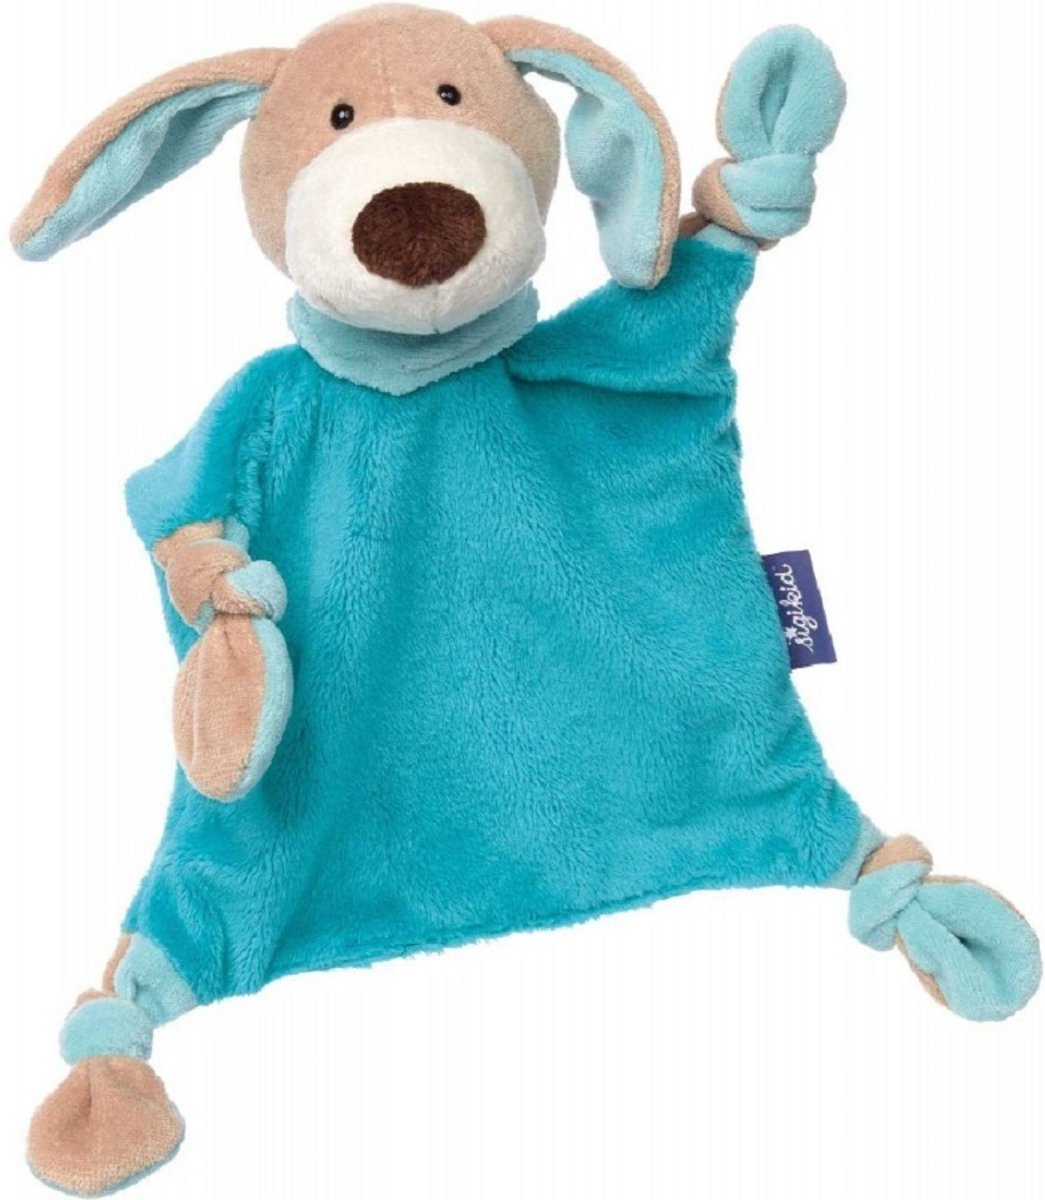 sigikid blauwe collectie knuffeldoekje hond pastel 41854